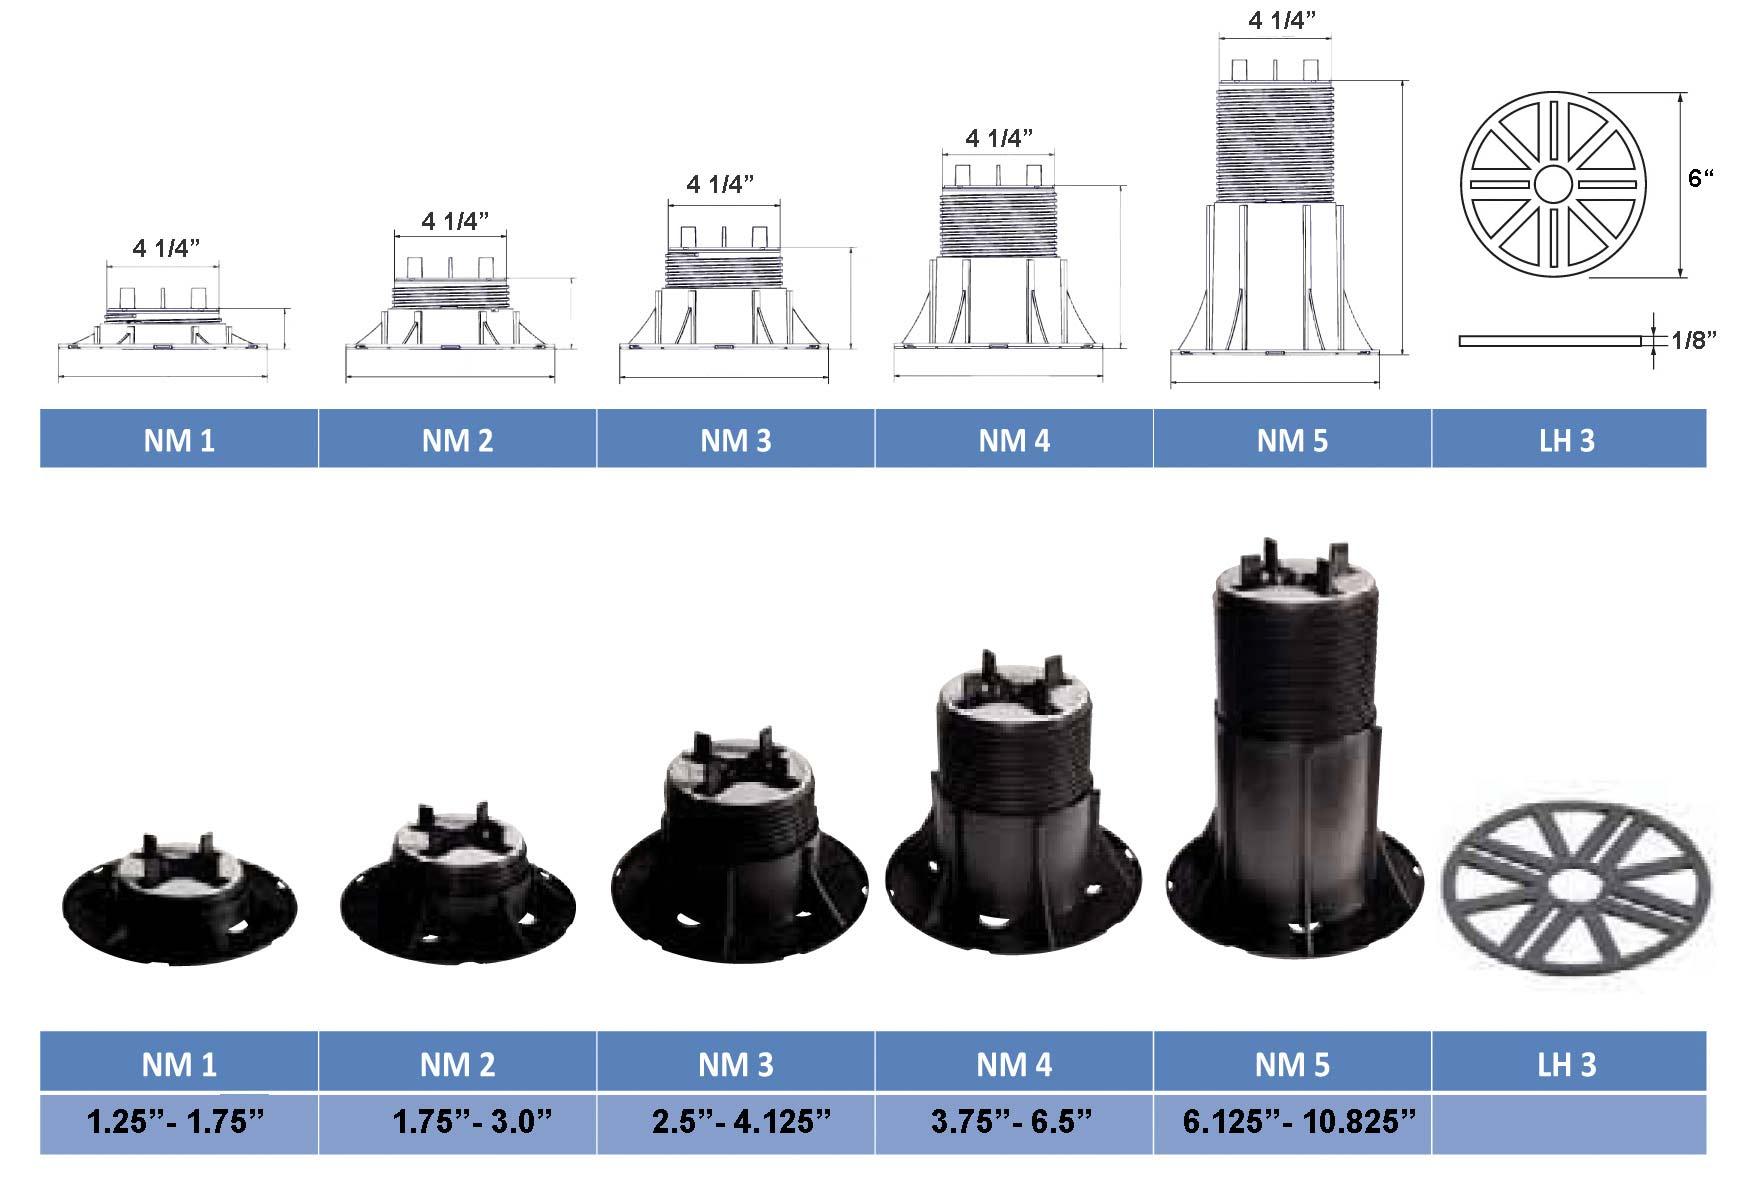 Maxi pedestal system size chart